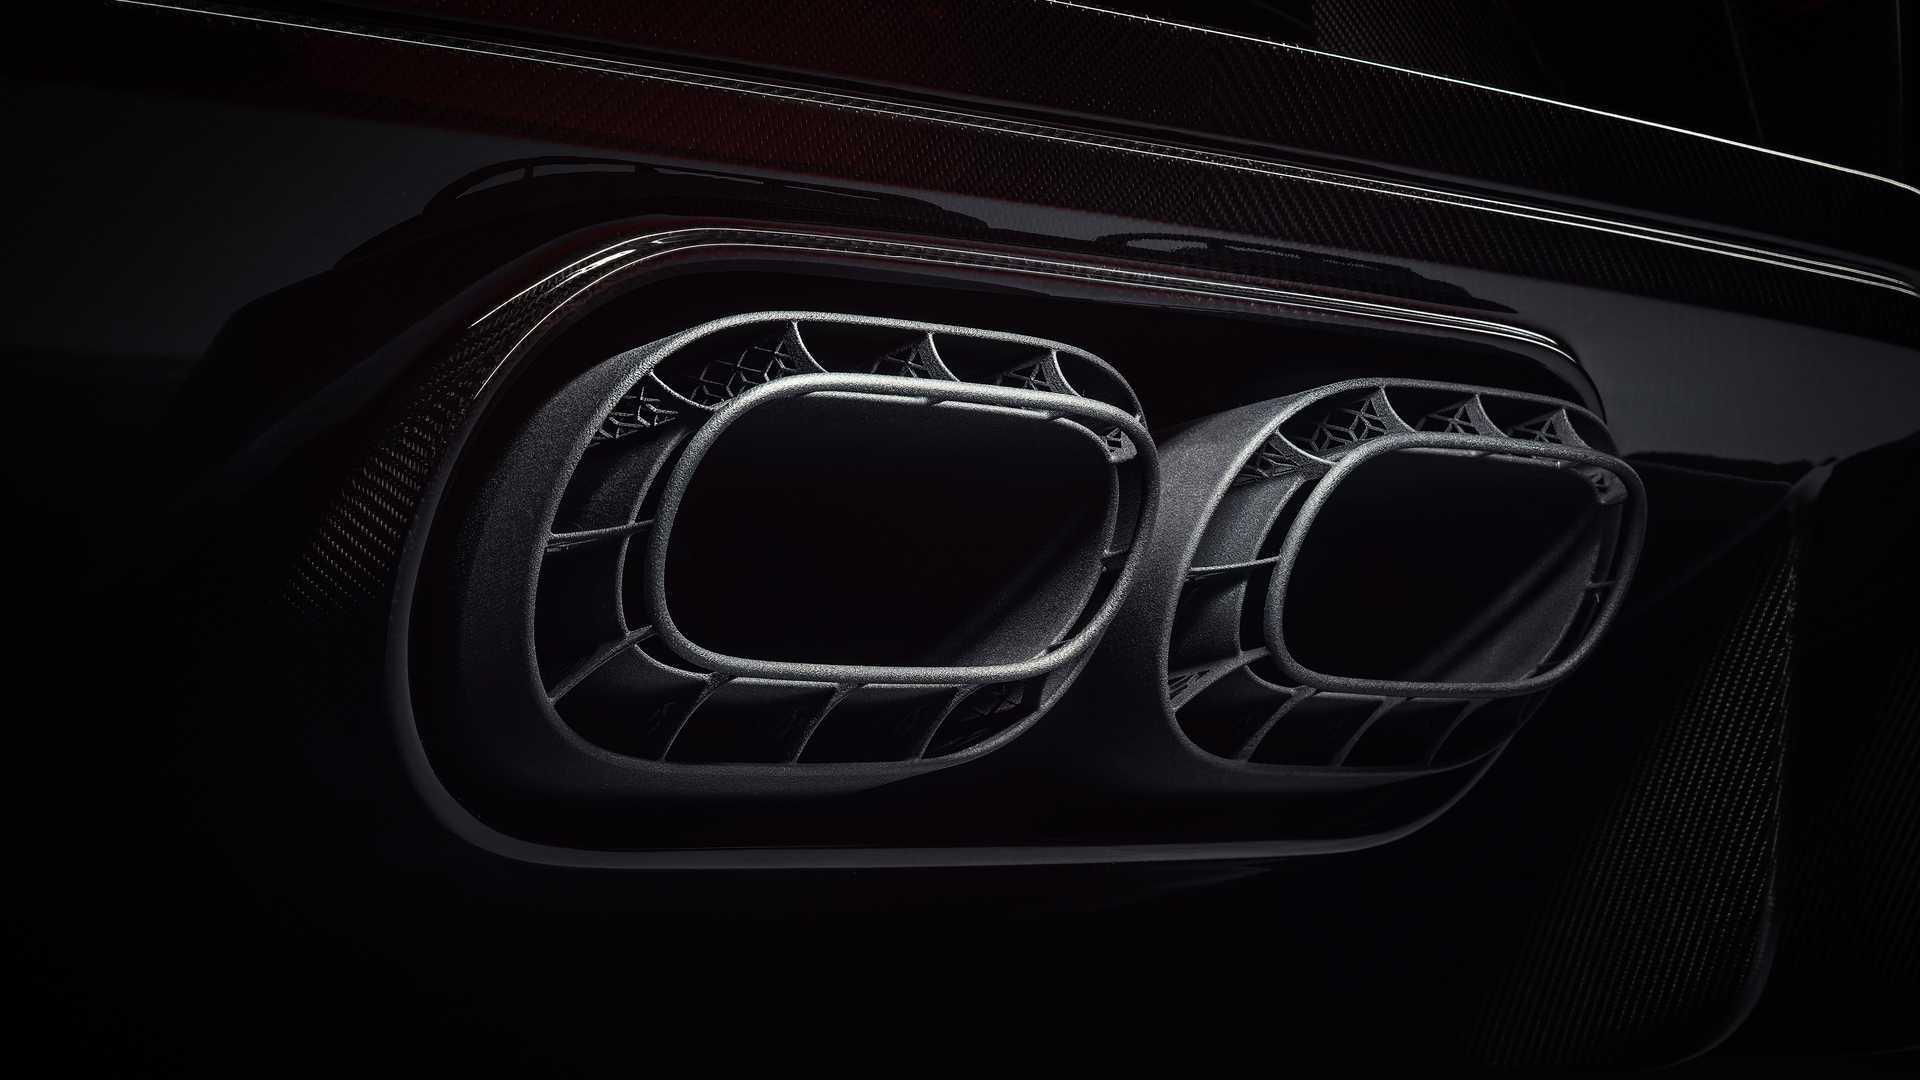 bugatti uses 3d printed titanium covers